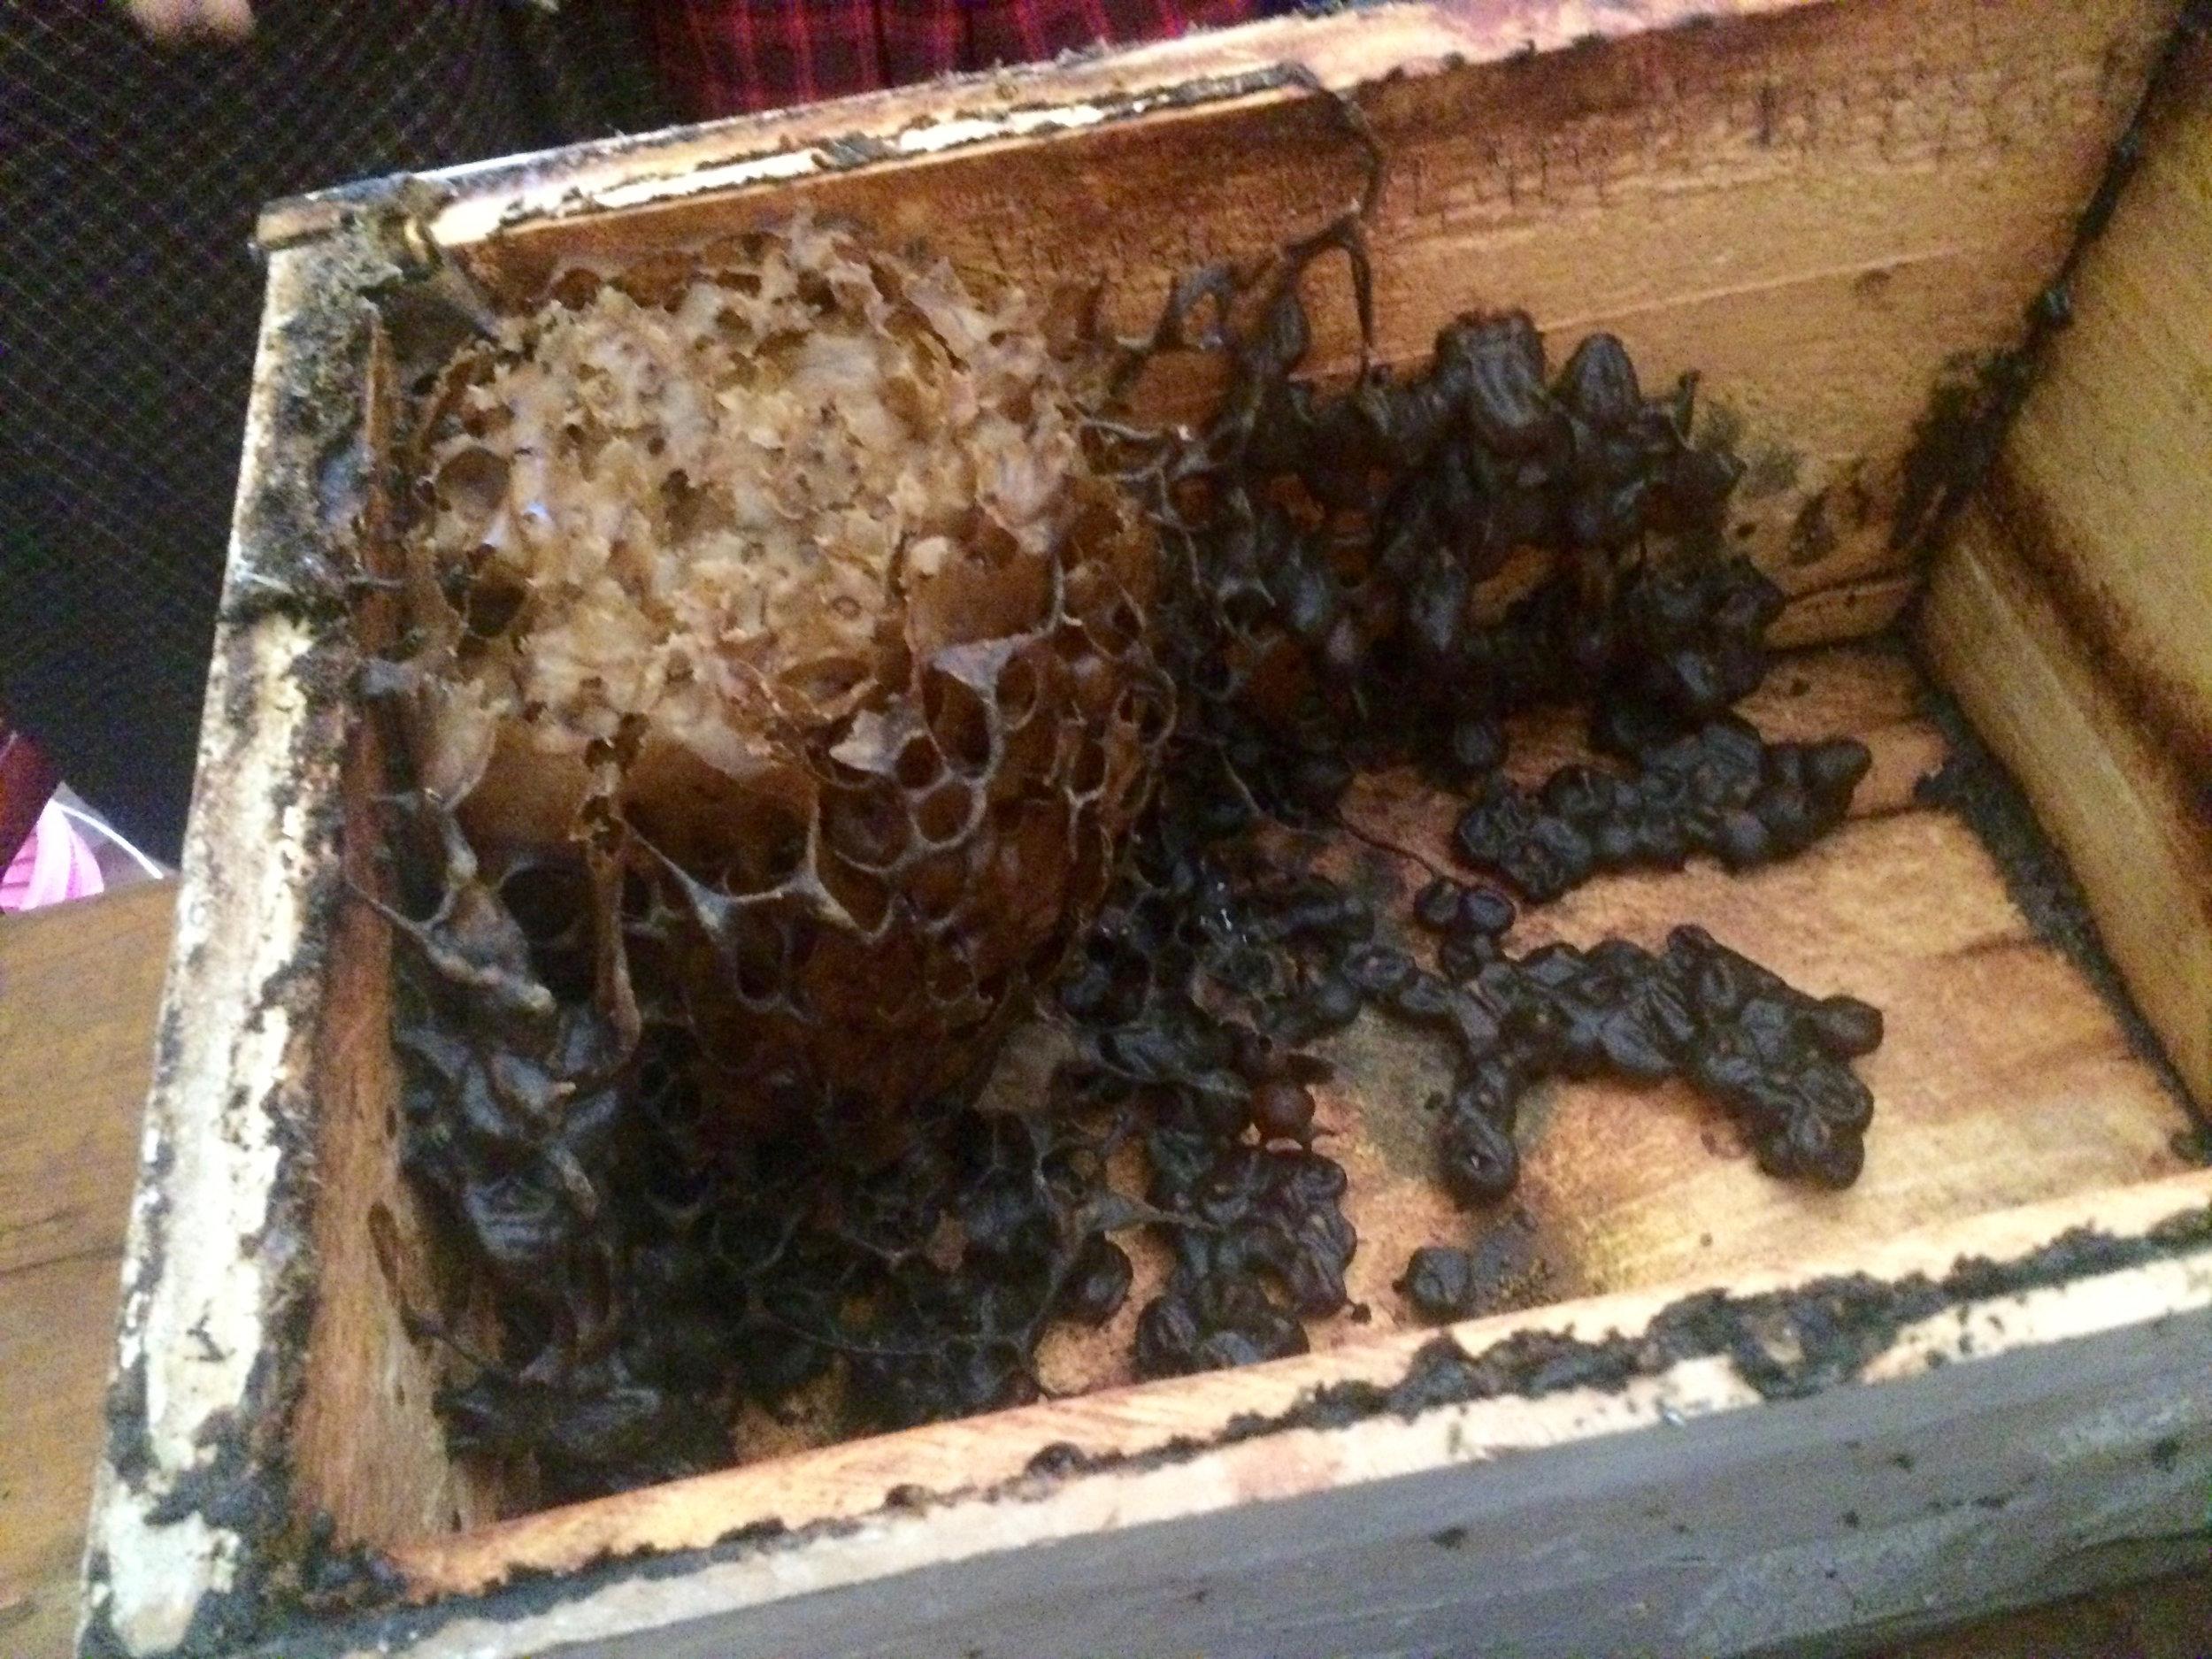 Inside a Stingless Beehive